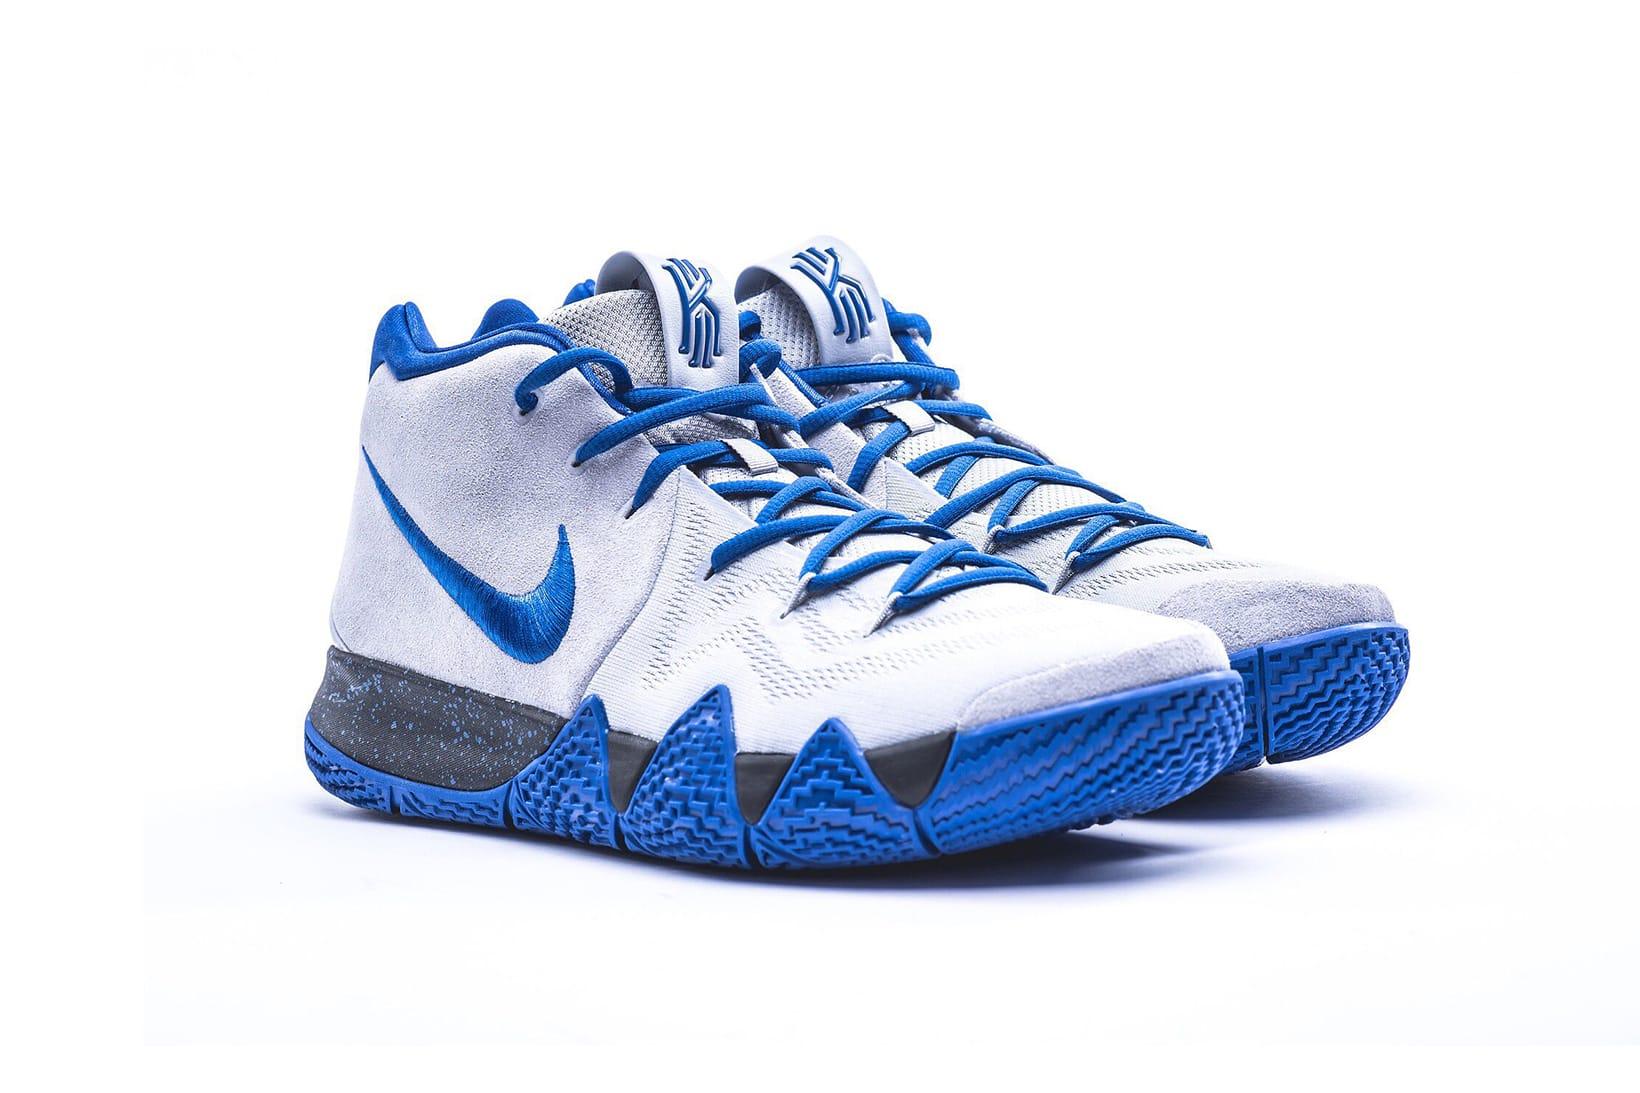 Nike Kyrie 4 Duke PE | HYPEBEAST